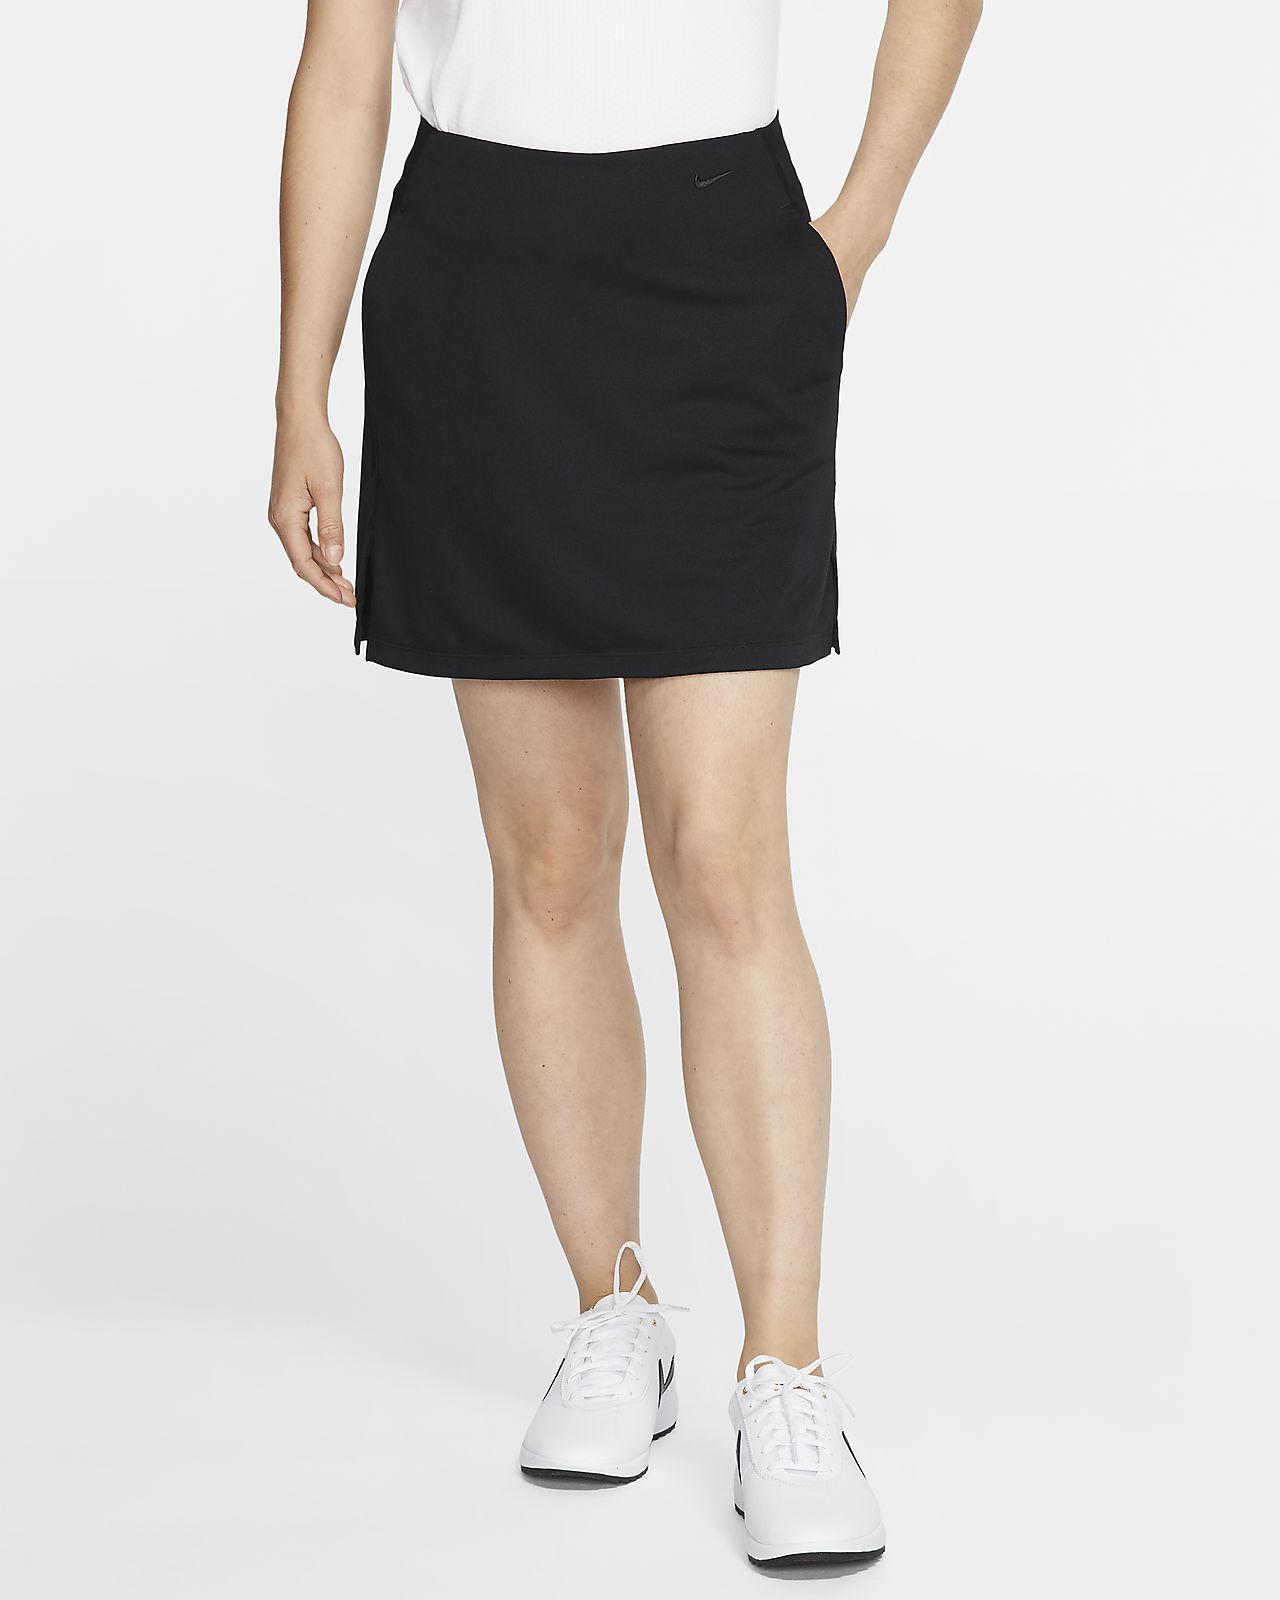 foto ufficiali 78476 216af Gonna da golf 43 cm Nike Dri-FIT Victory - Donna. Nike CH